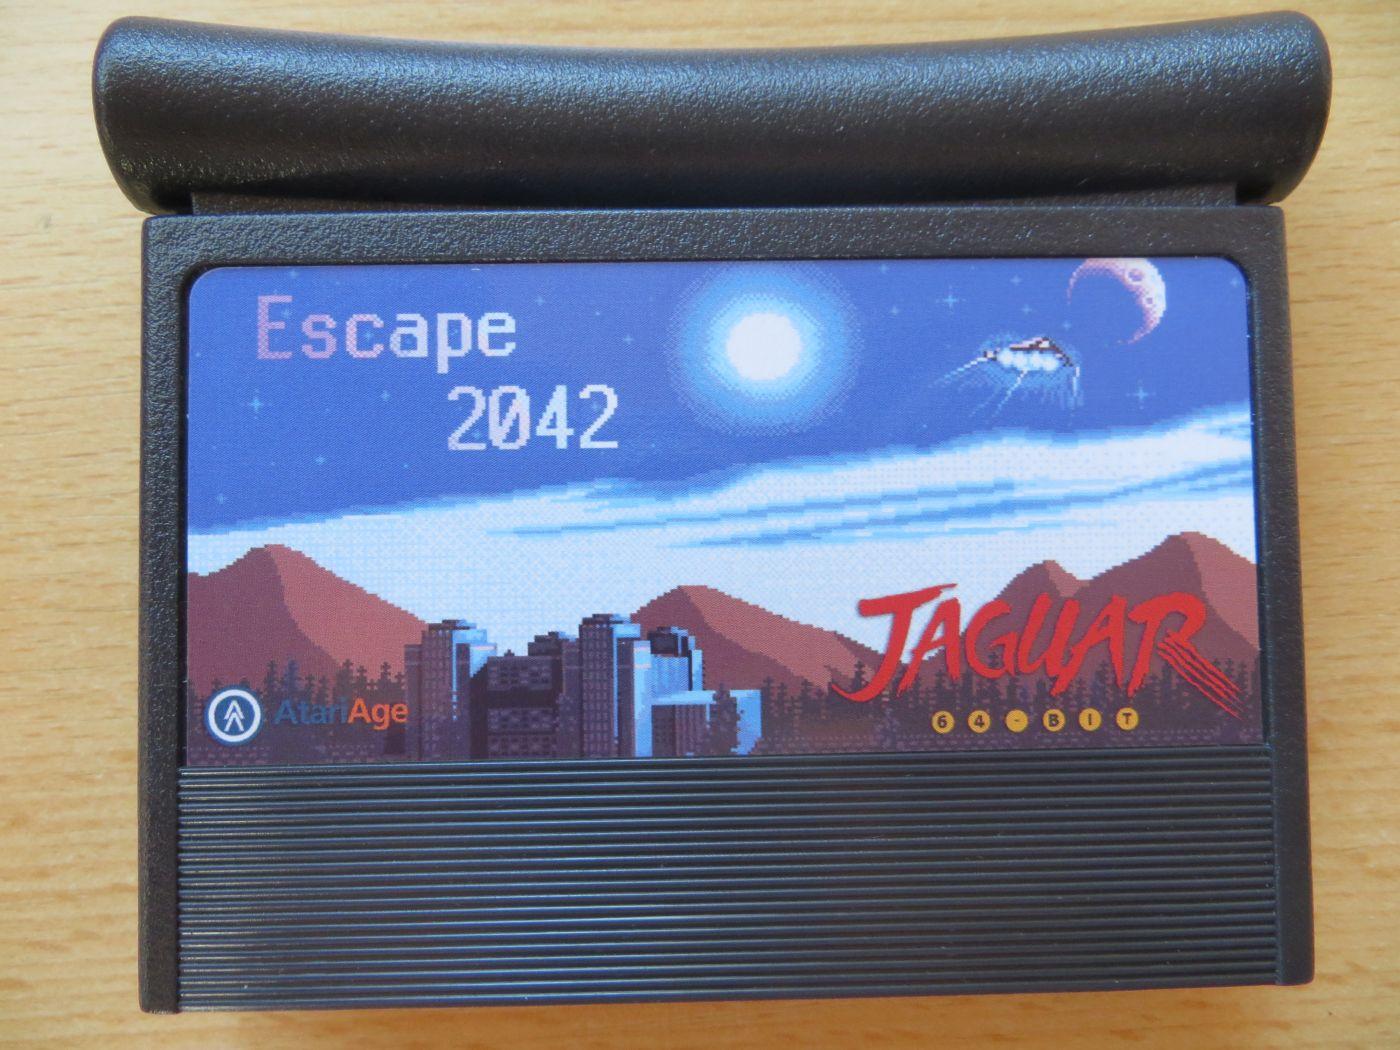 Escape 2042 - Cartridge